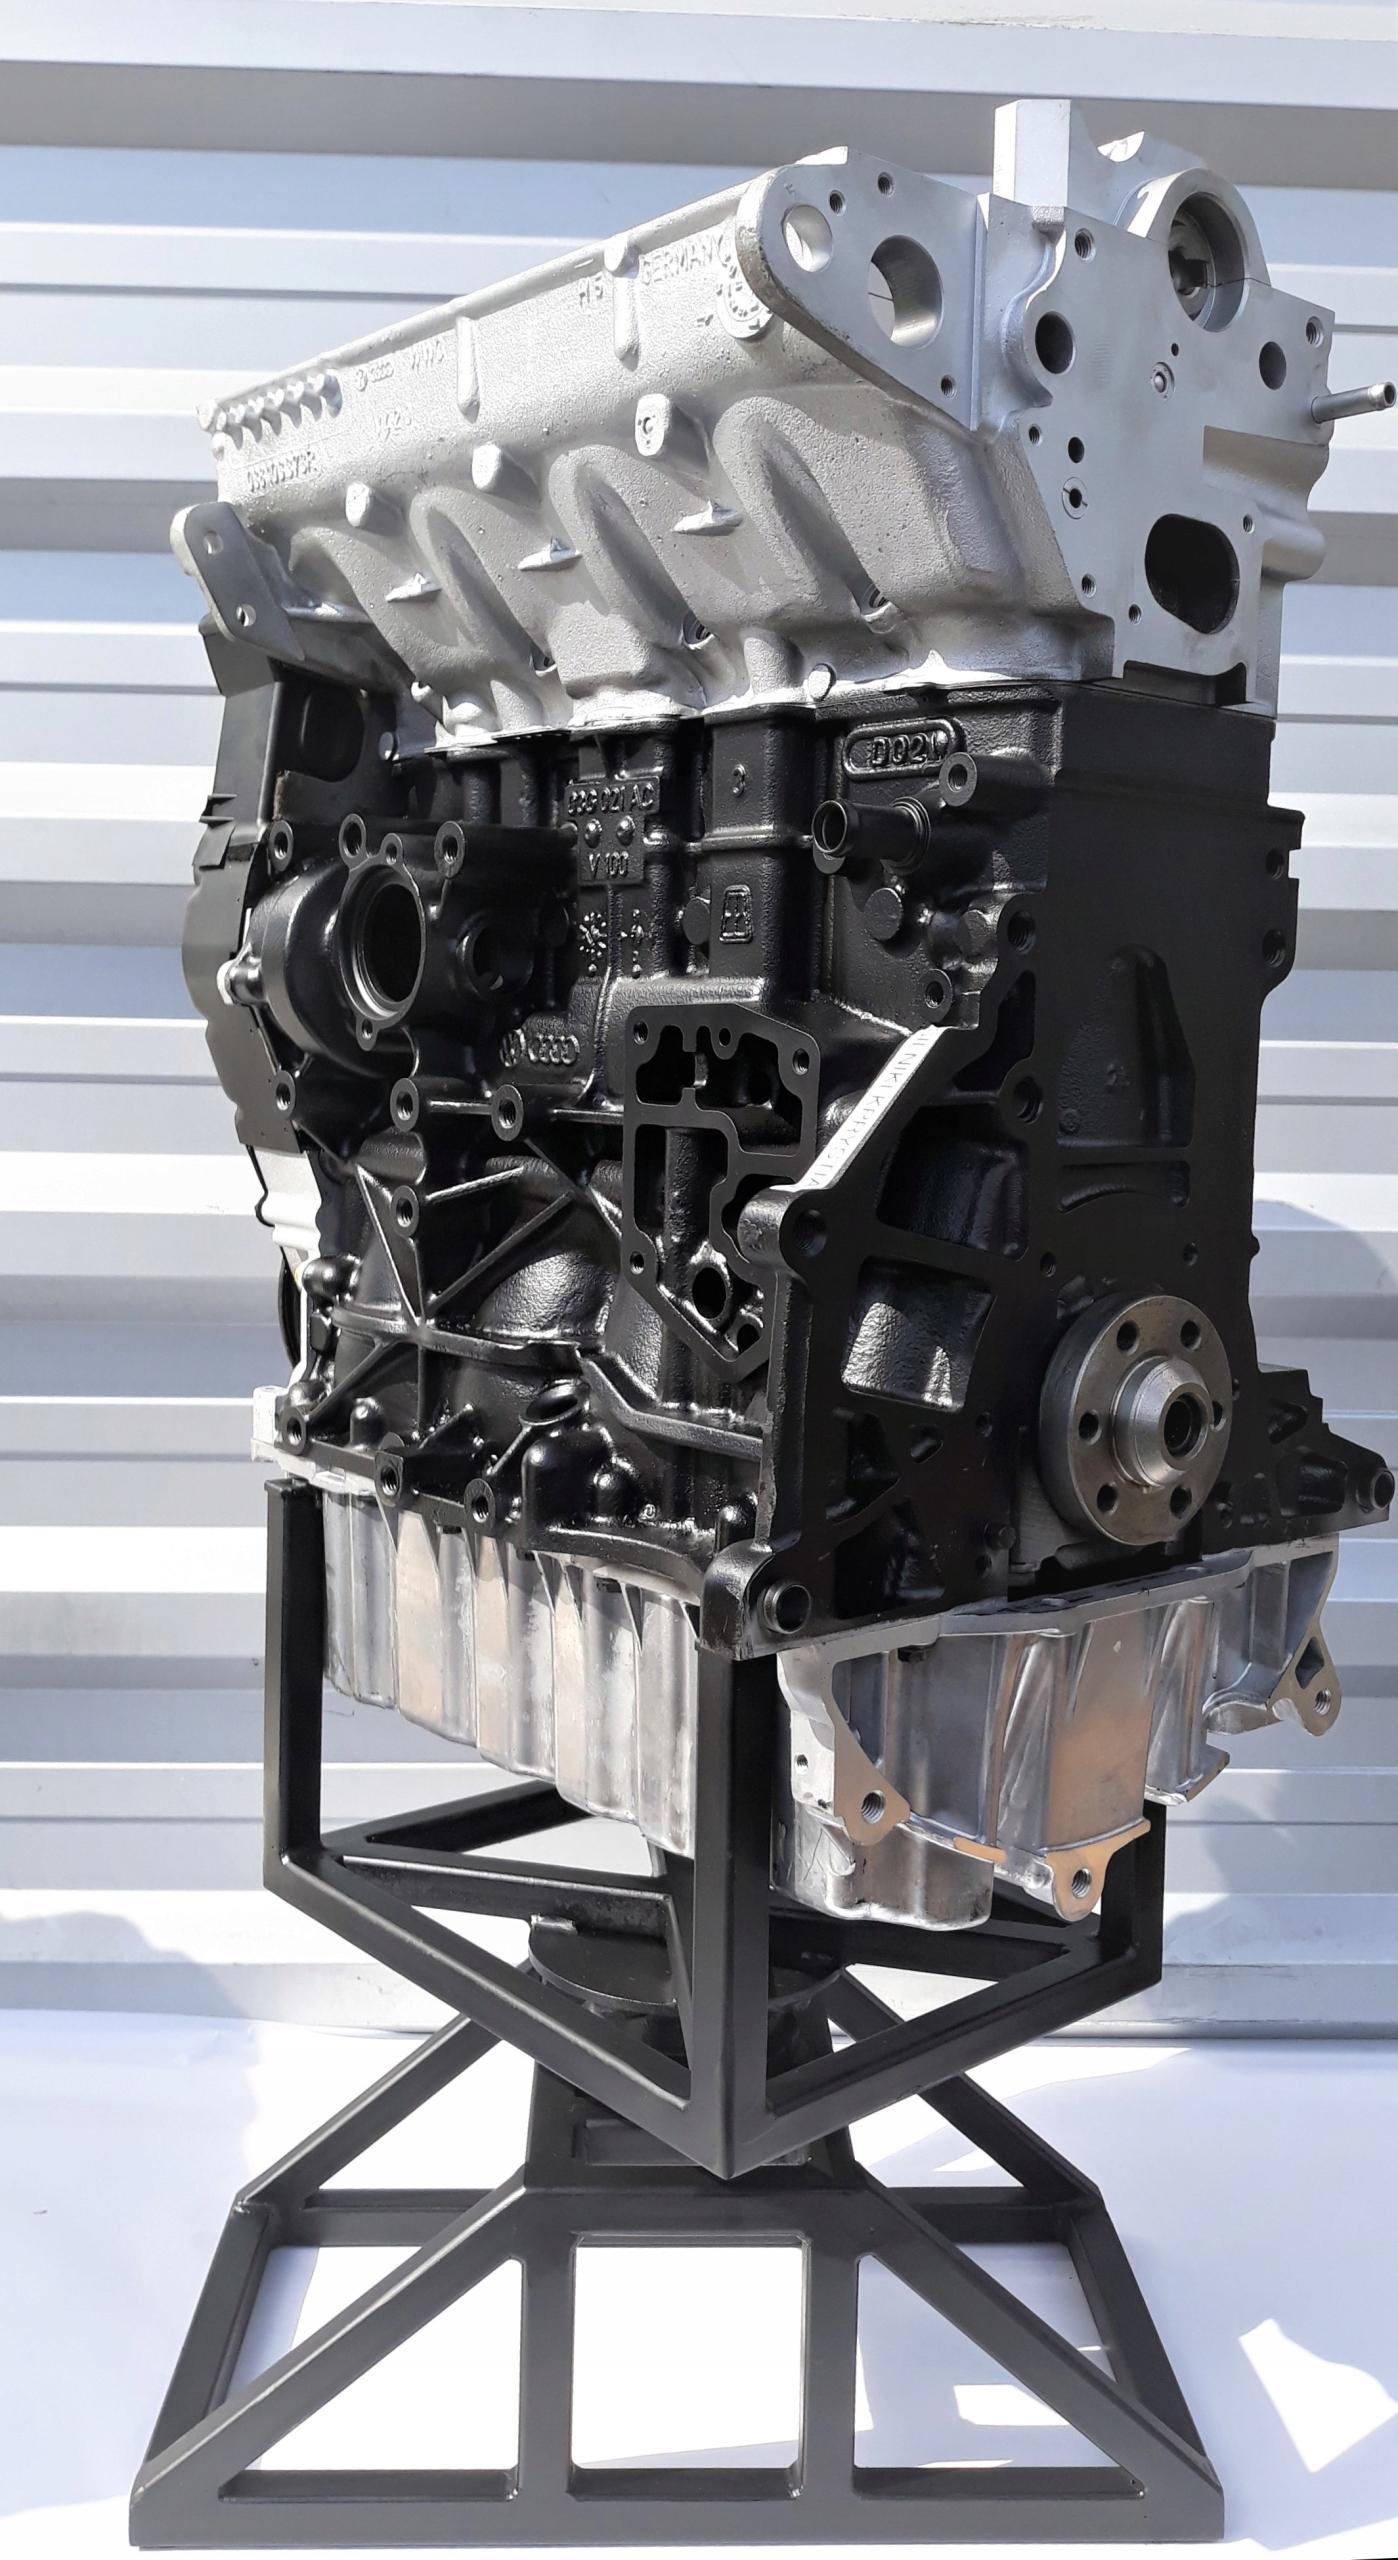 Гарантия Двигатель BLS 1.9 TDI 105KM GOLF TOURAN1